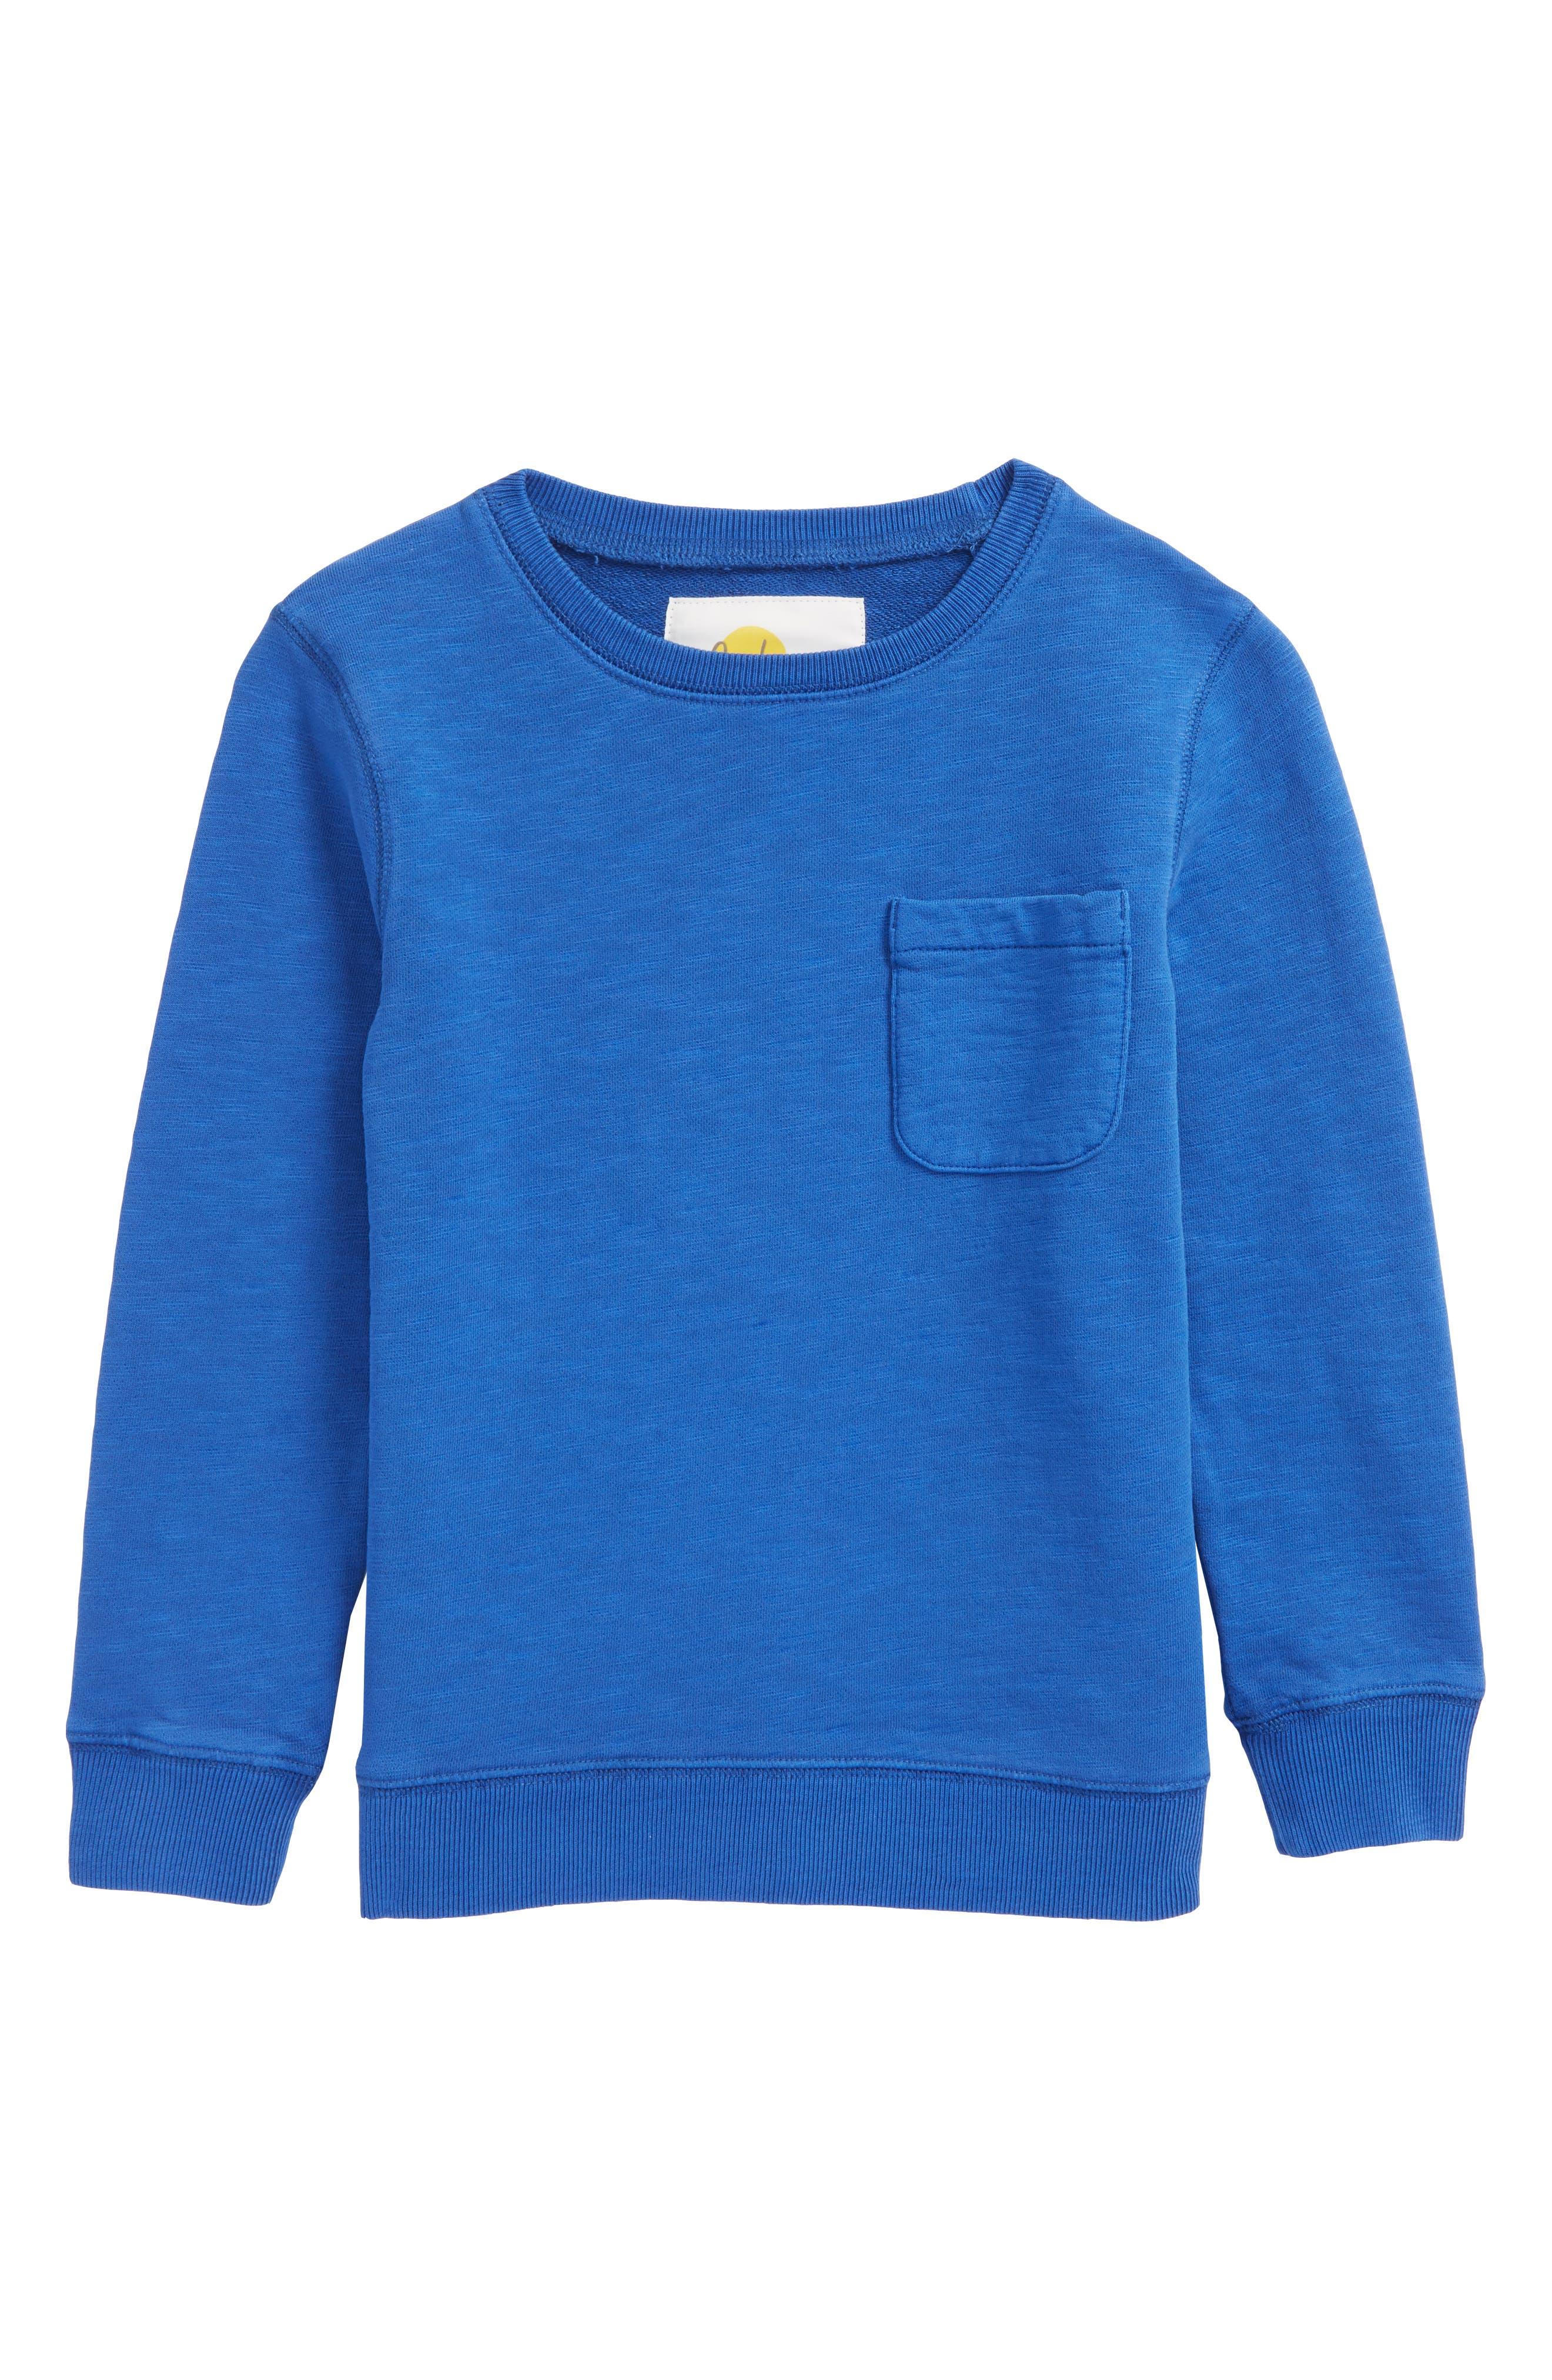 Pocket Crewneck Sweatshirt,                         Main,                         color, Orion Blue